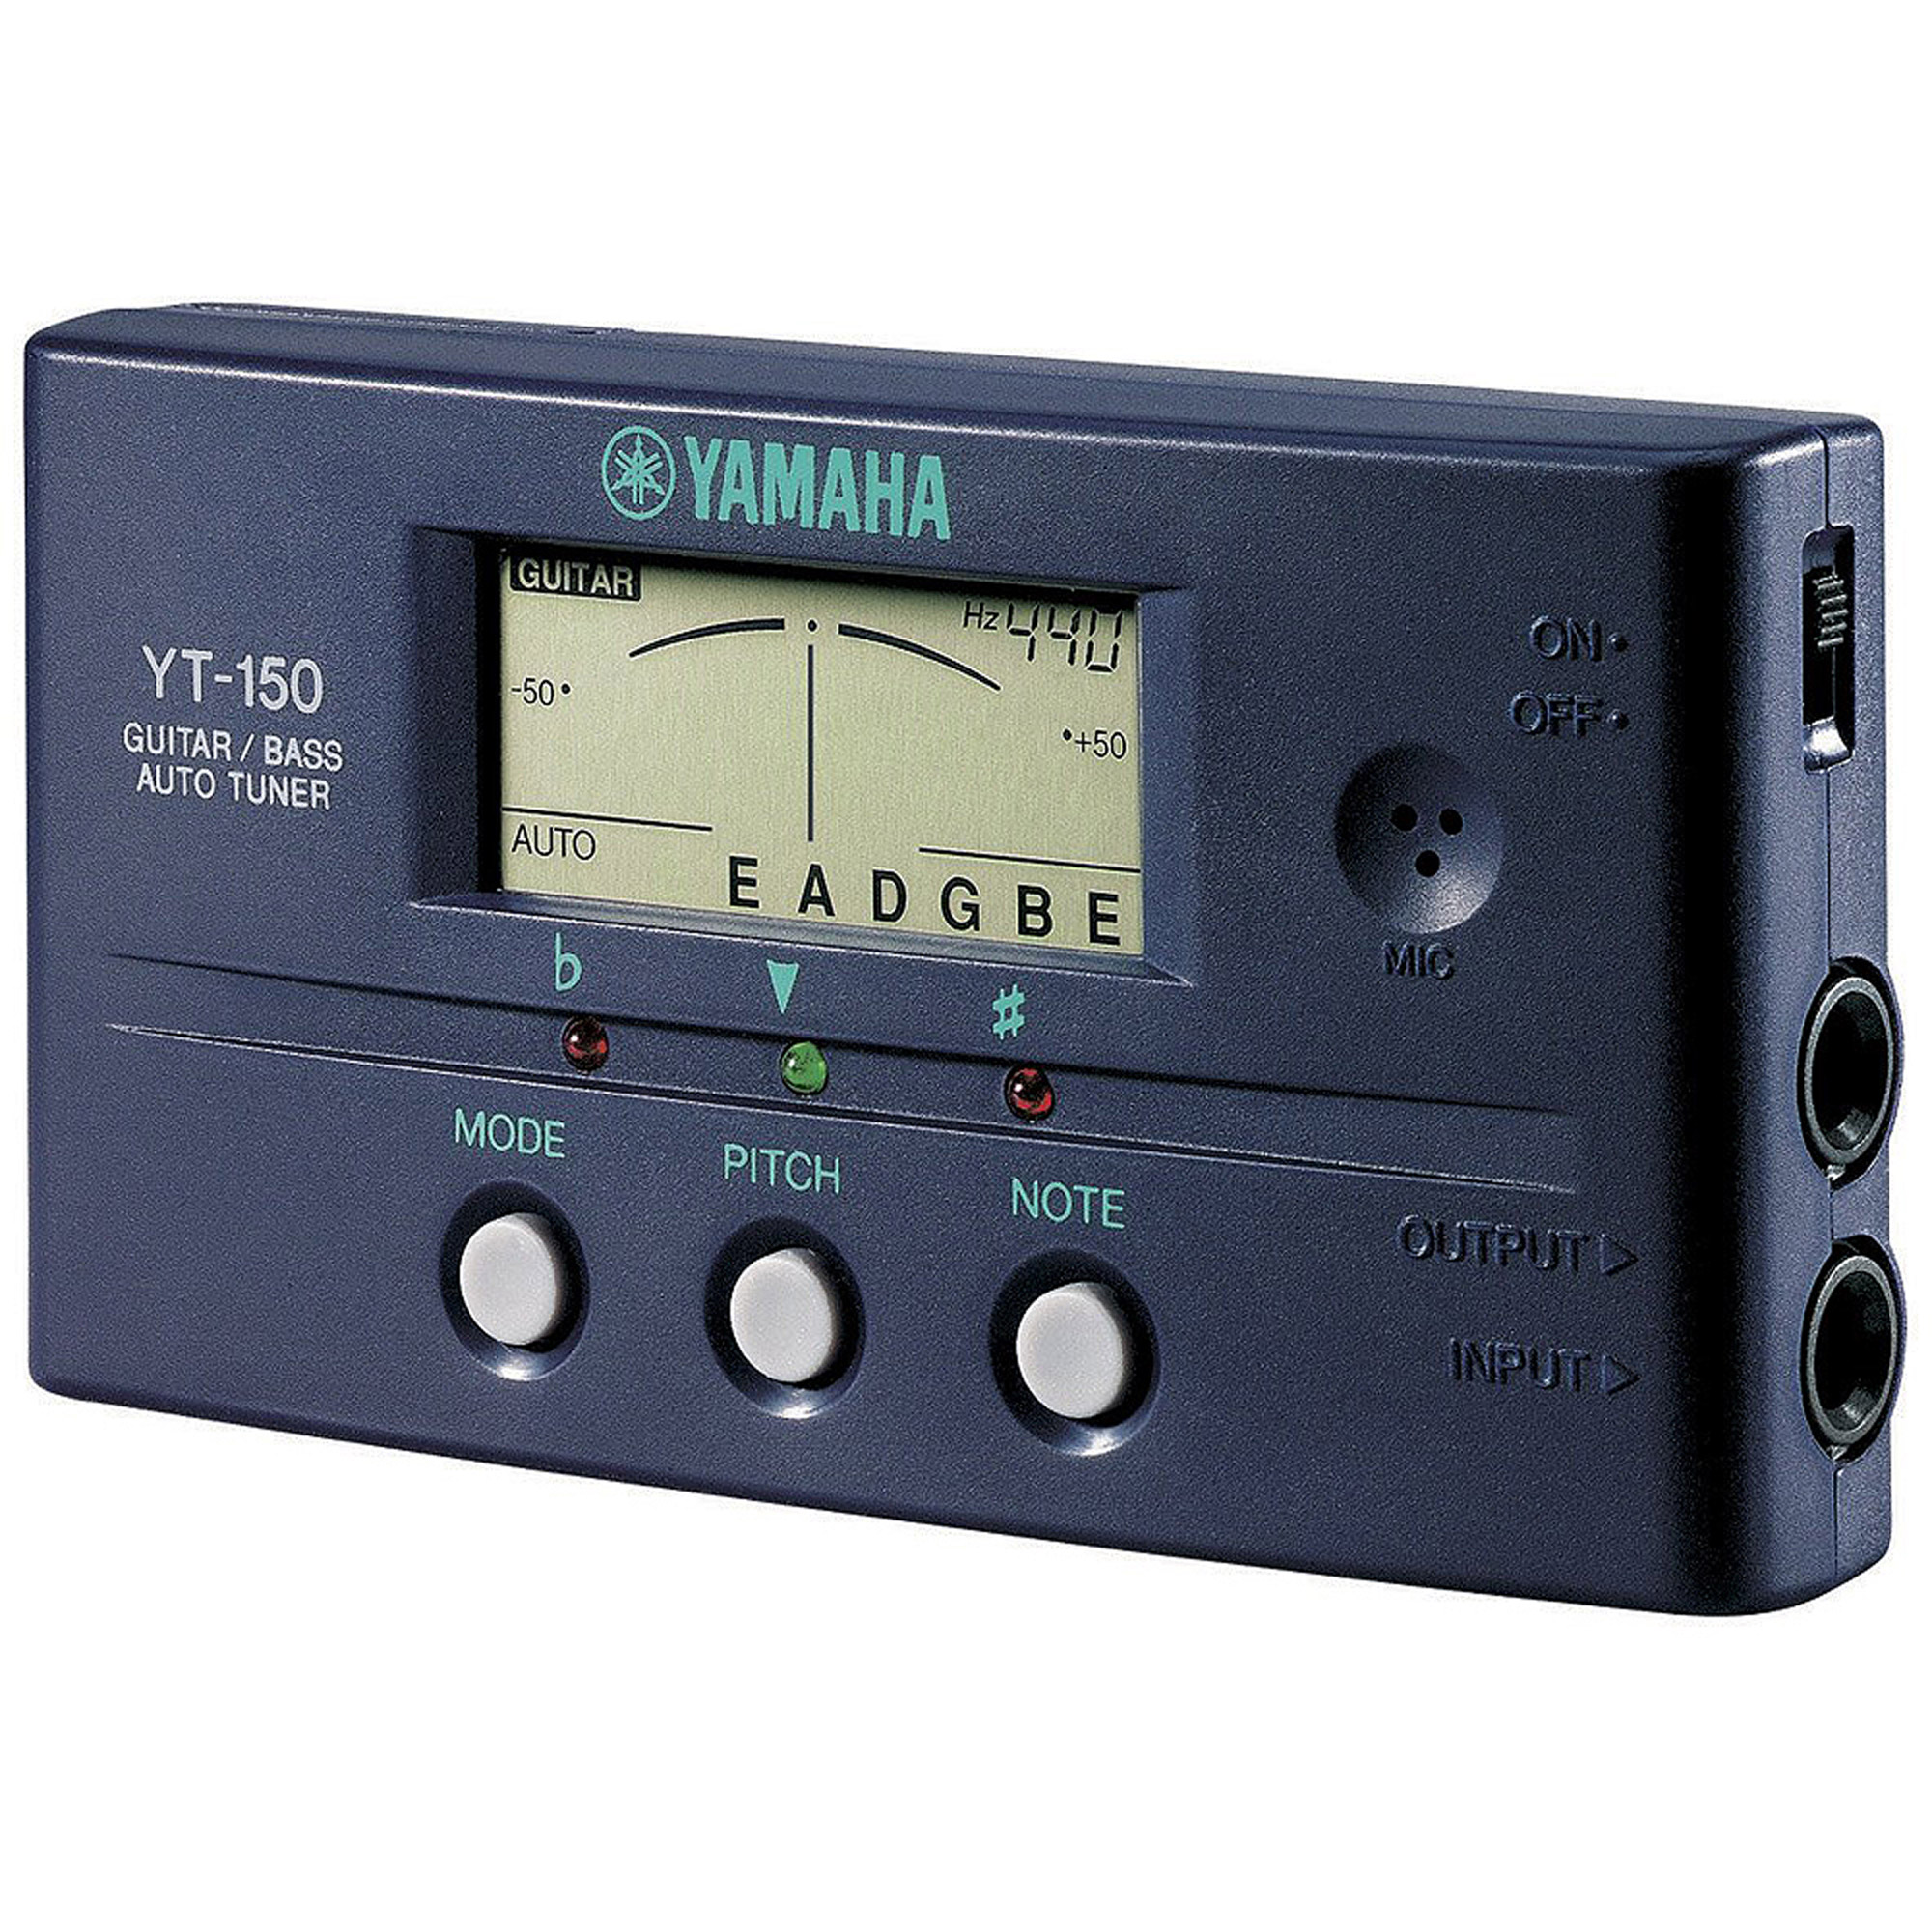 Yamaha YT150 Guitar/Bass Auto Tuner